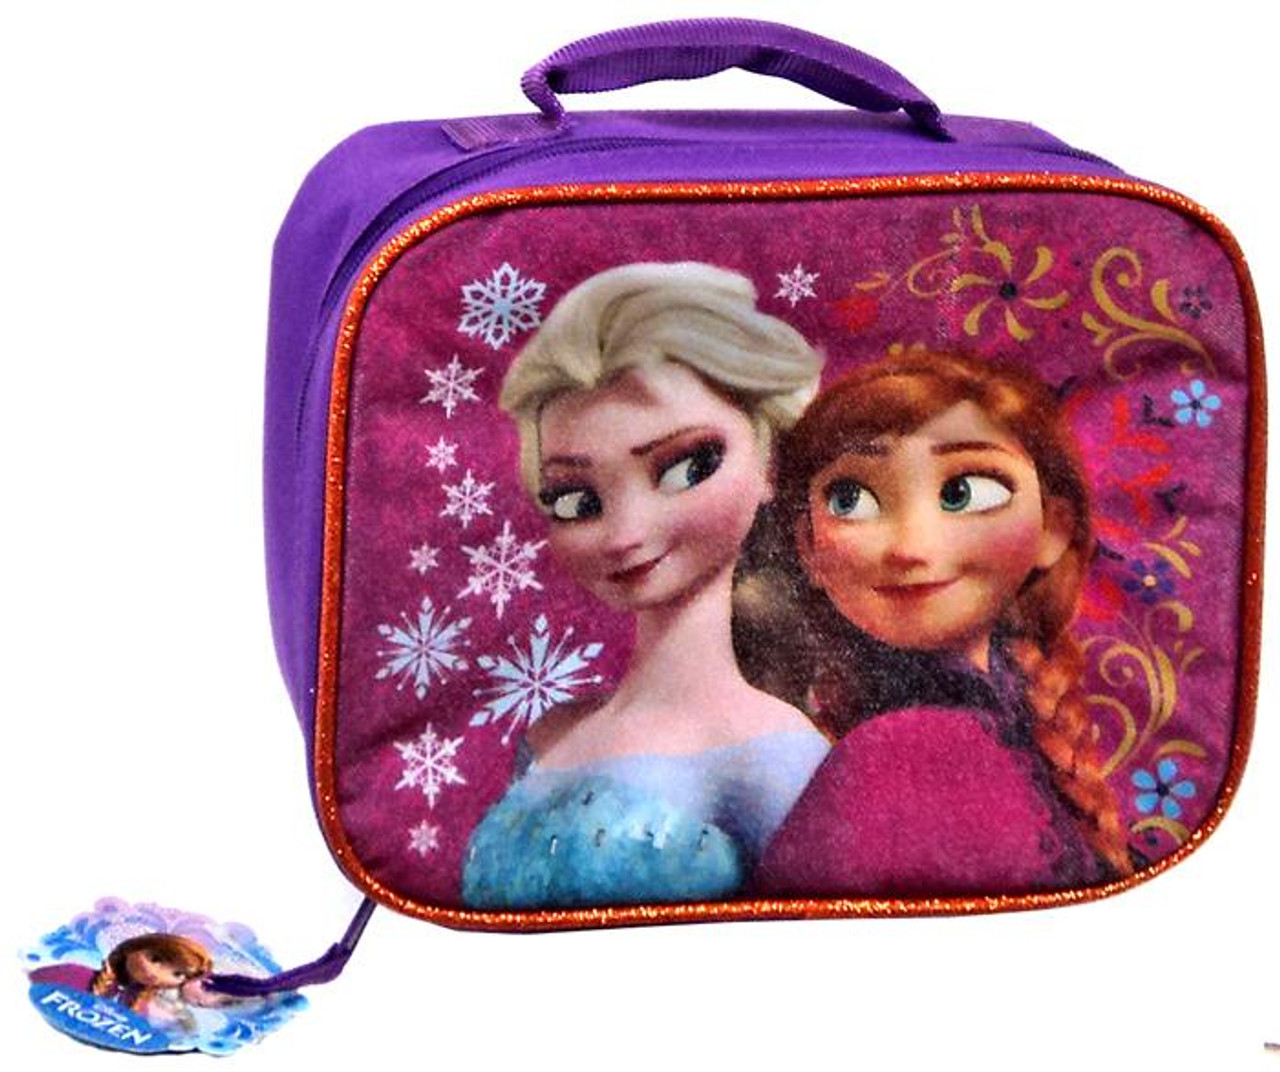 Disney Frozen Anna & Elsa Lunch Tote [Flowers & Snowflakes]